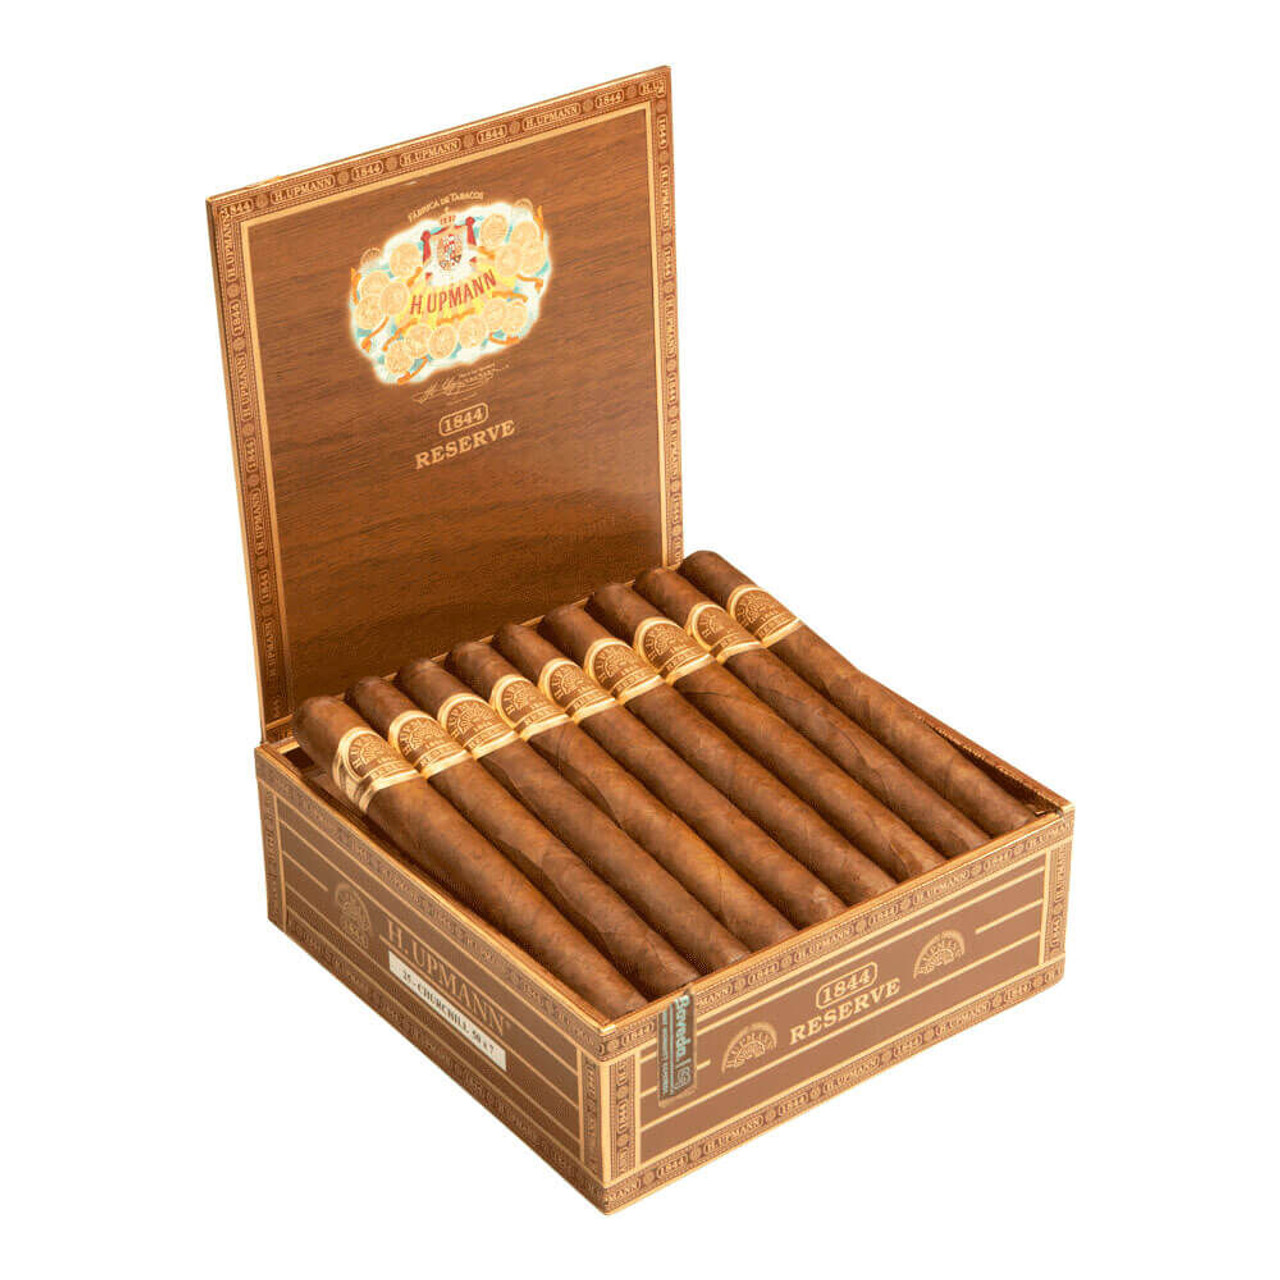 H. Upmann 1844 Reserve Churchill EMS Cigars - 7 x 50 (Box of 25)